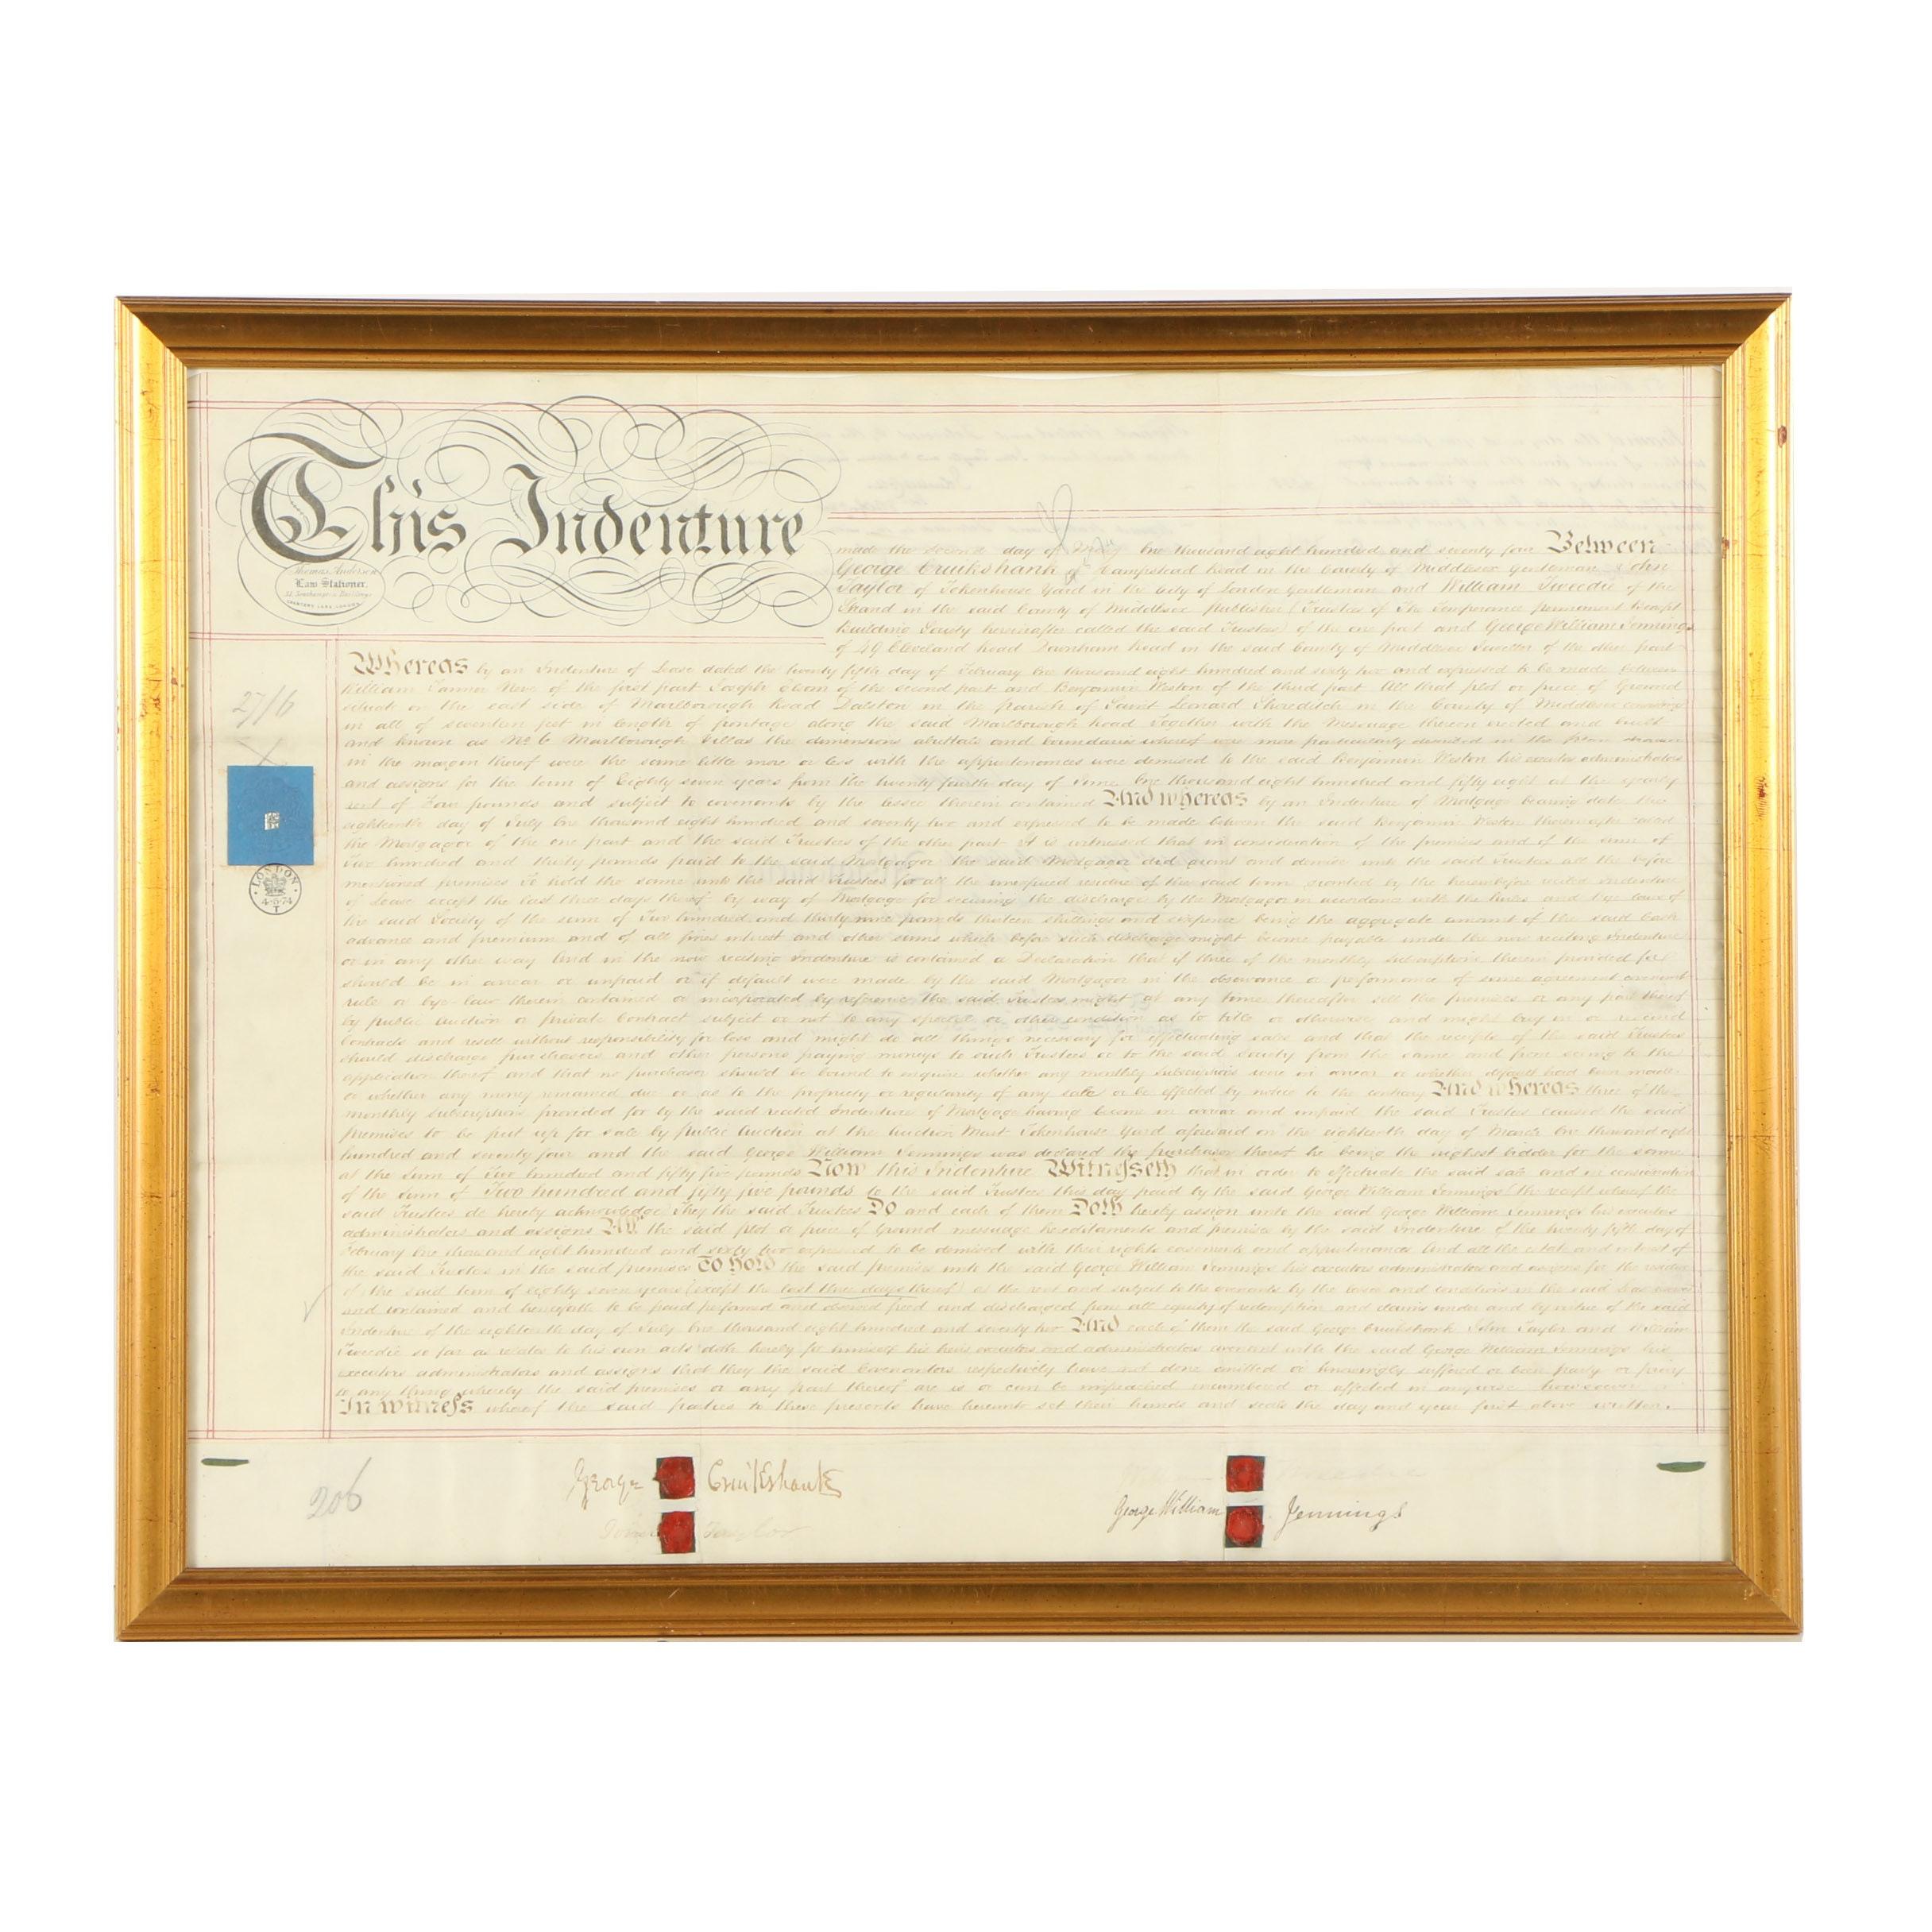 Framed 19th Century Mortgage Indenture